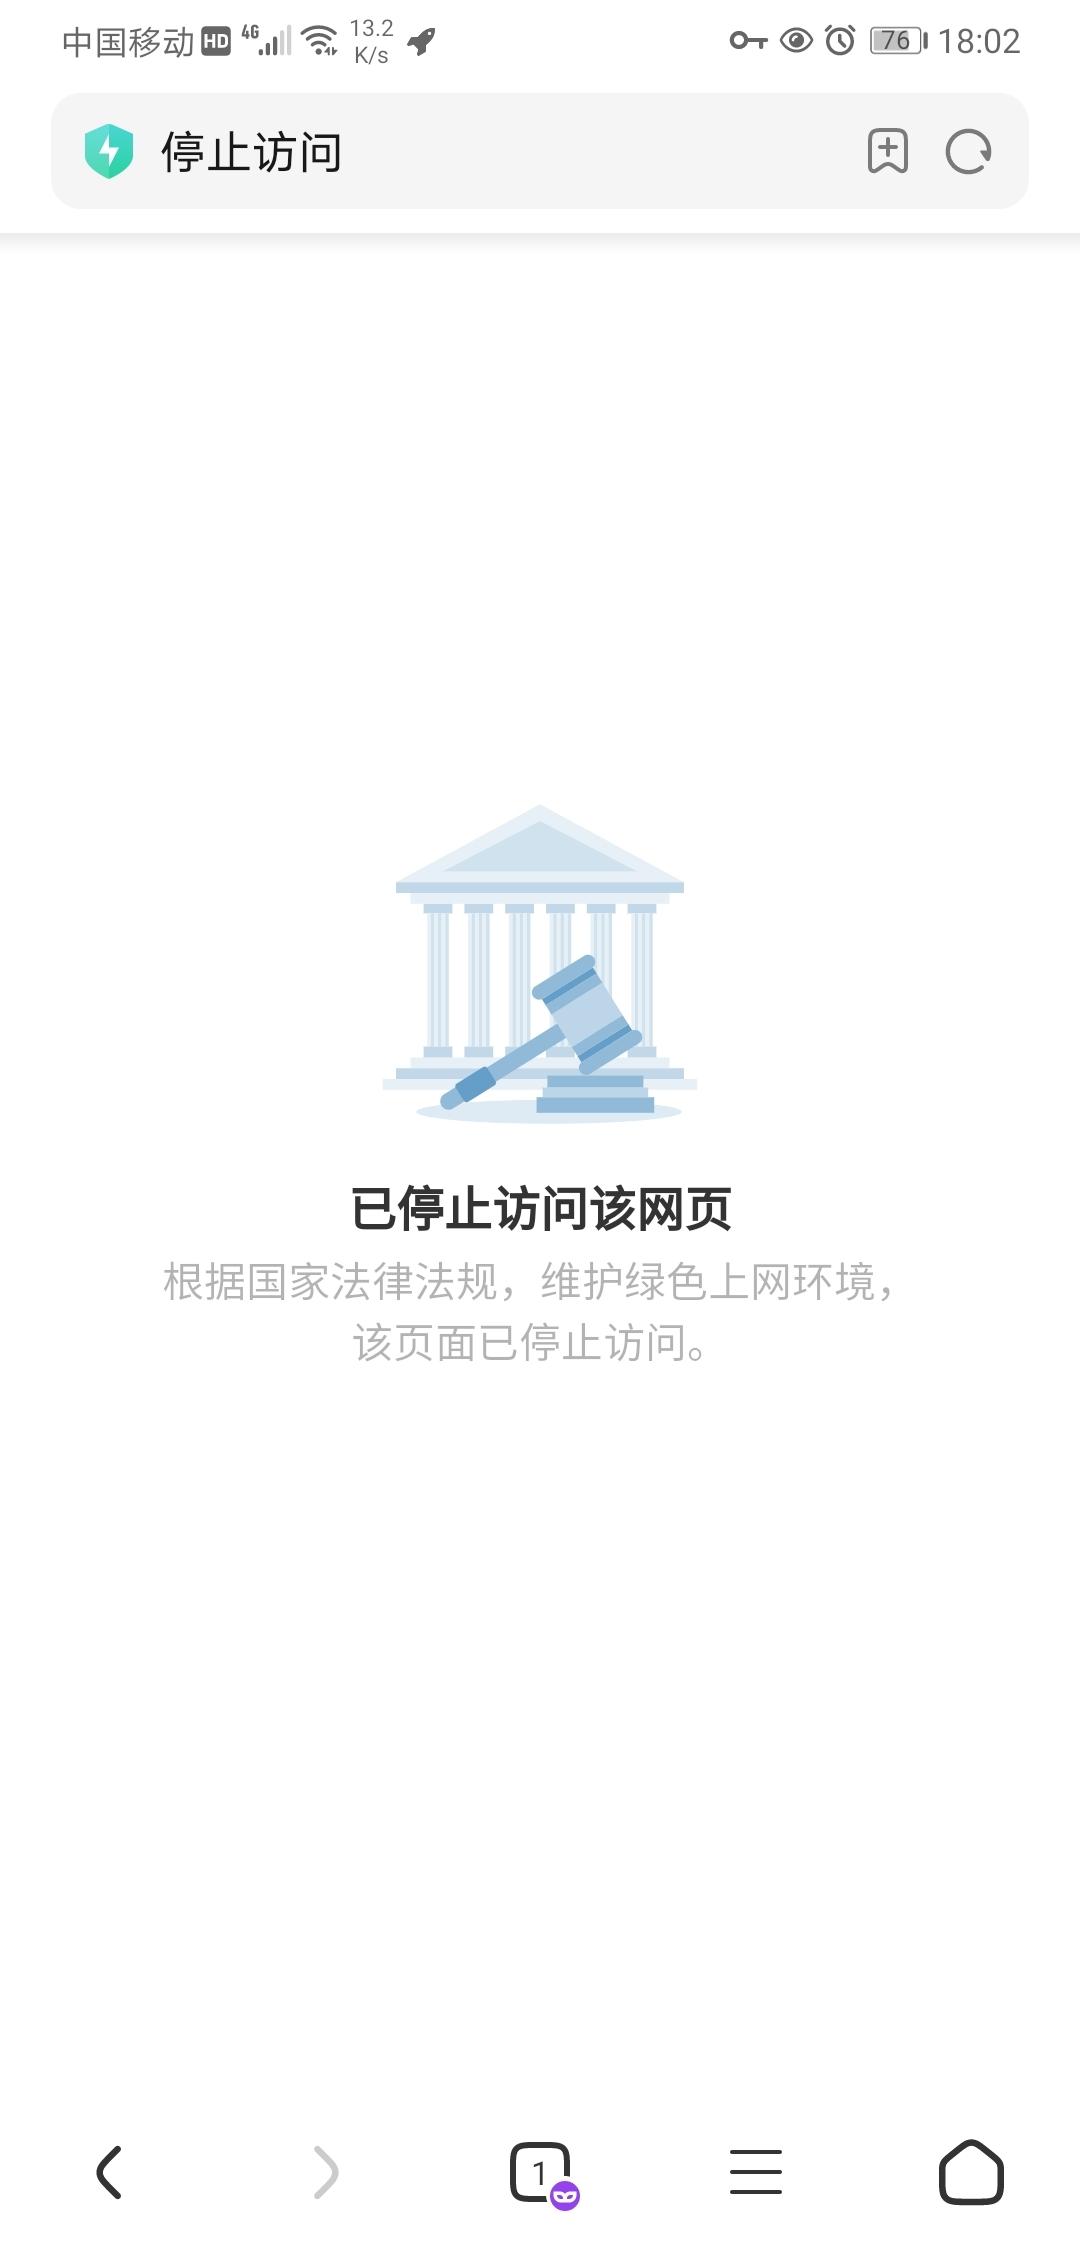 Screenshot_20210526_180239_com.android.browser.jpg